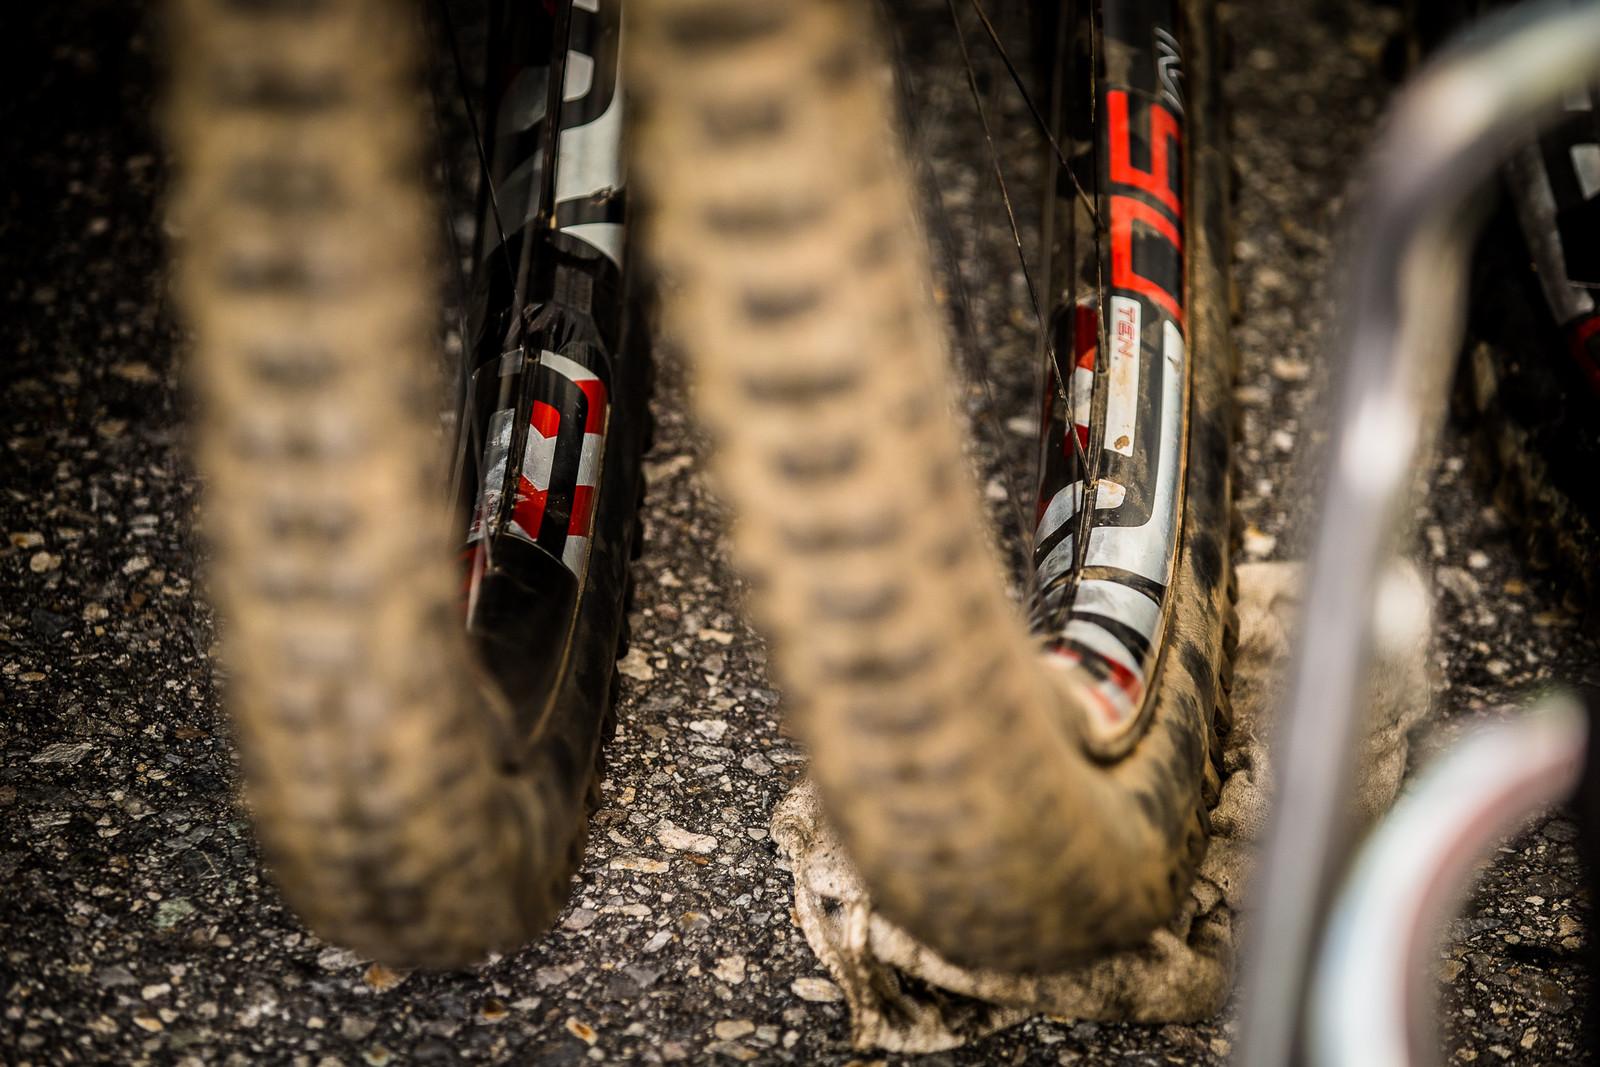 Extra Wide ENVE Rims? - PIT BITS - Lenzerheide World Cup DH - Mountain Biking Pictures - Vital MTB